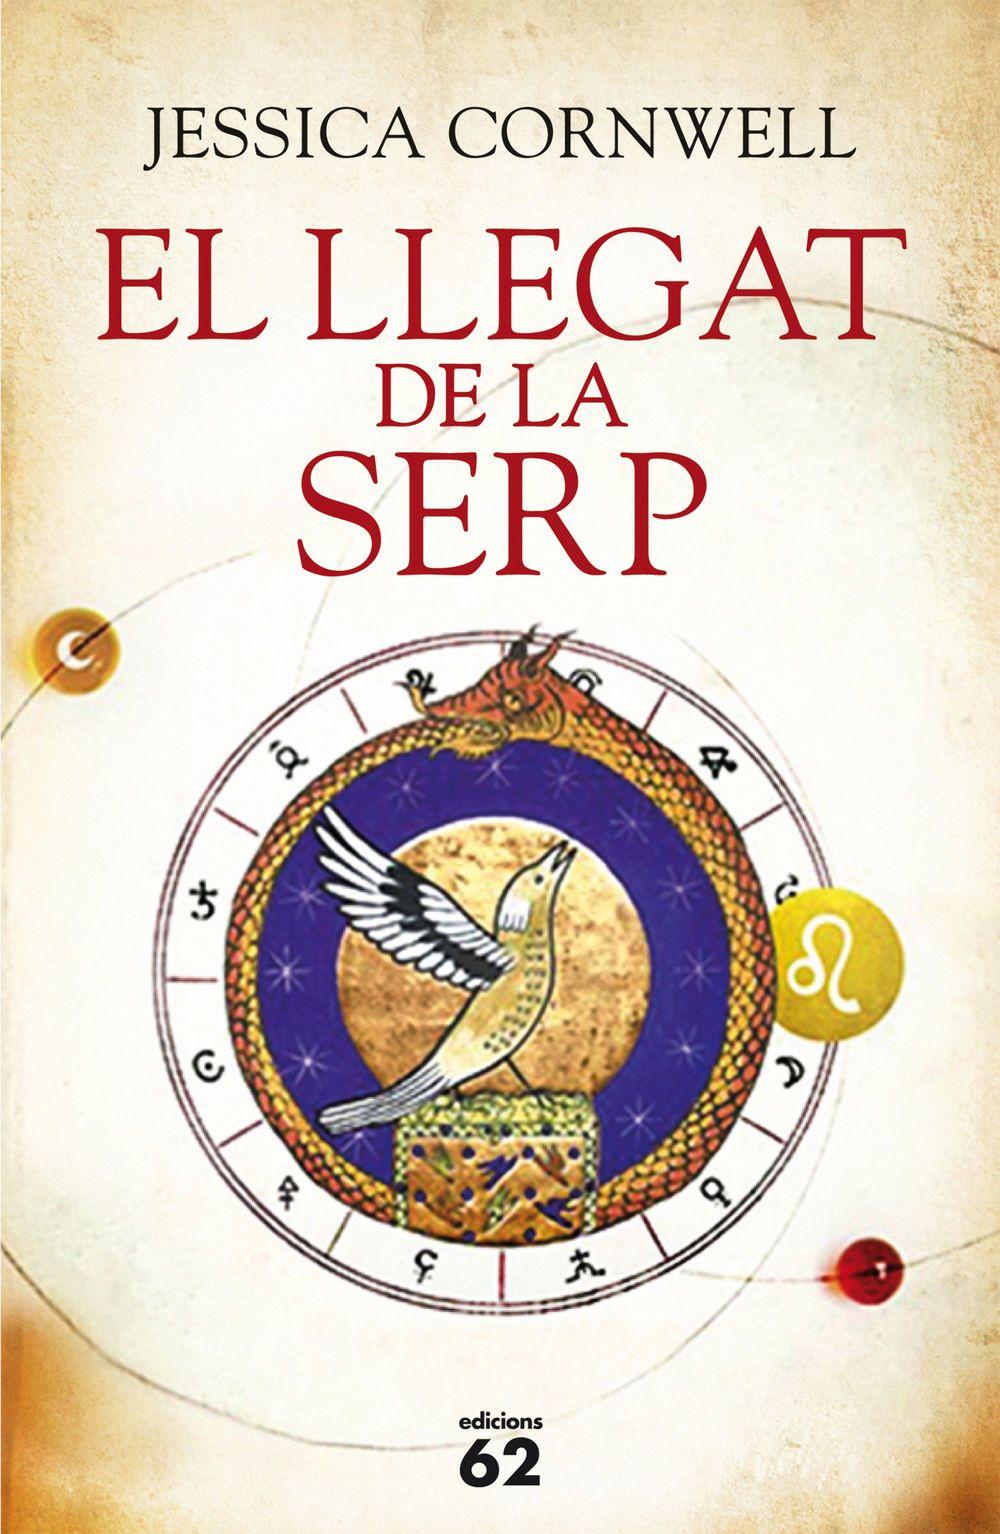 Edicions 62 – Catalan Translation, June 2015